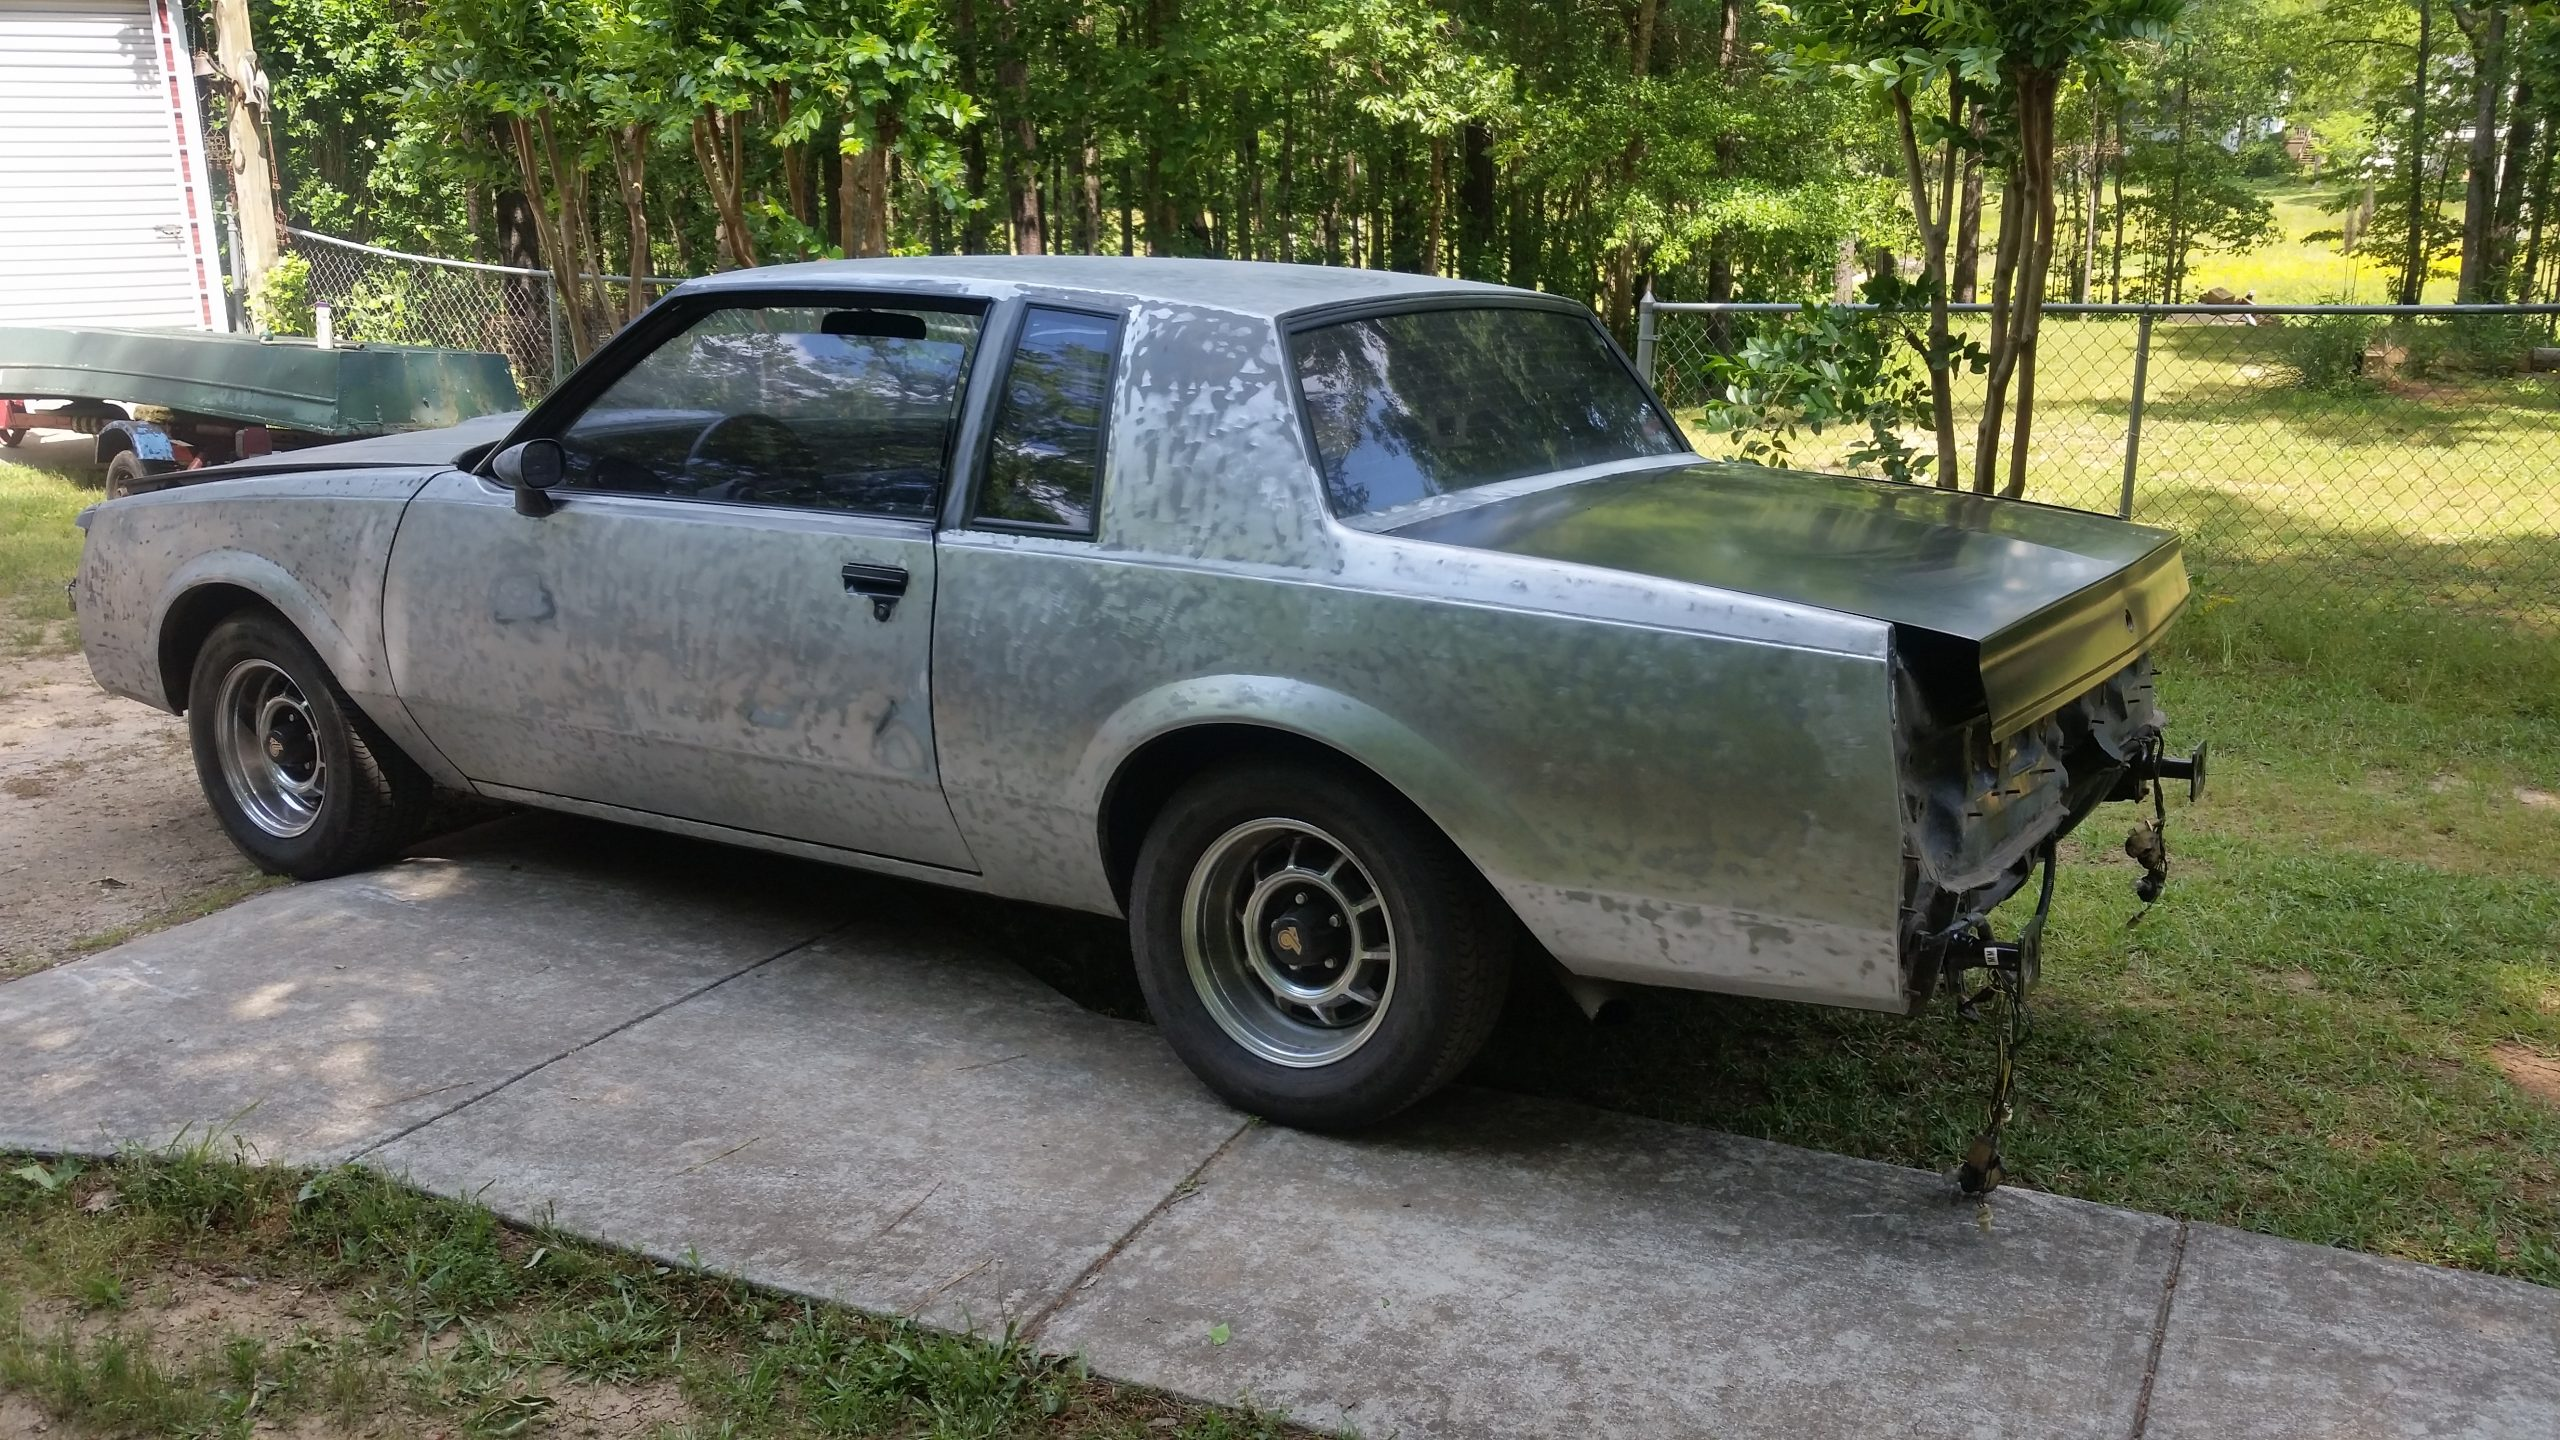 1987 Buick Grand National pre restoration